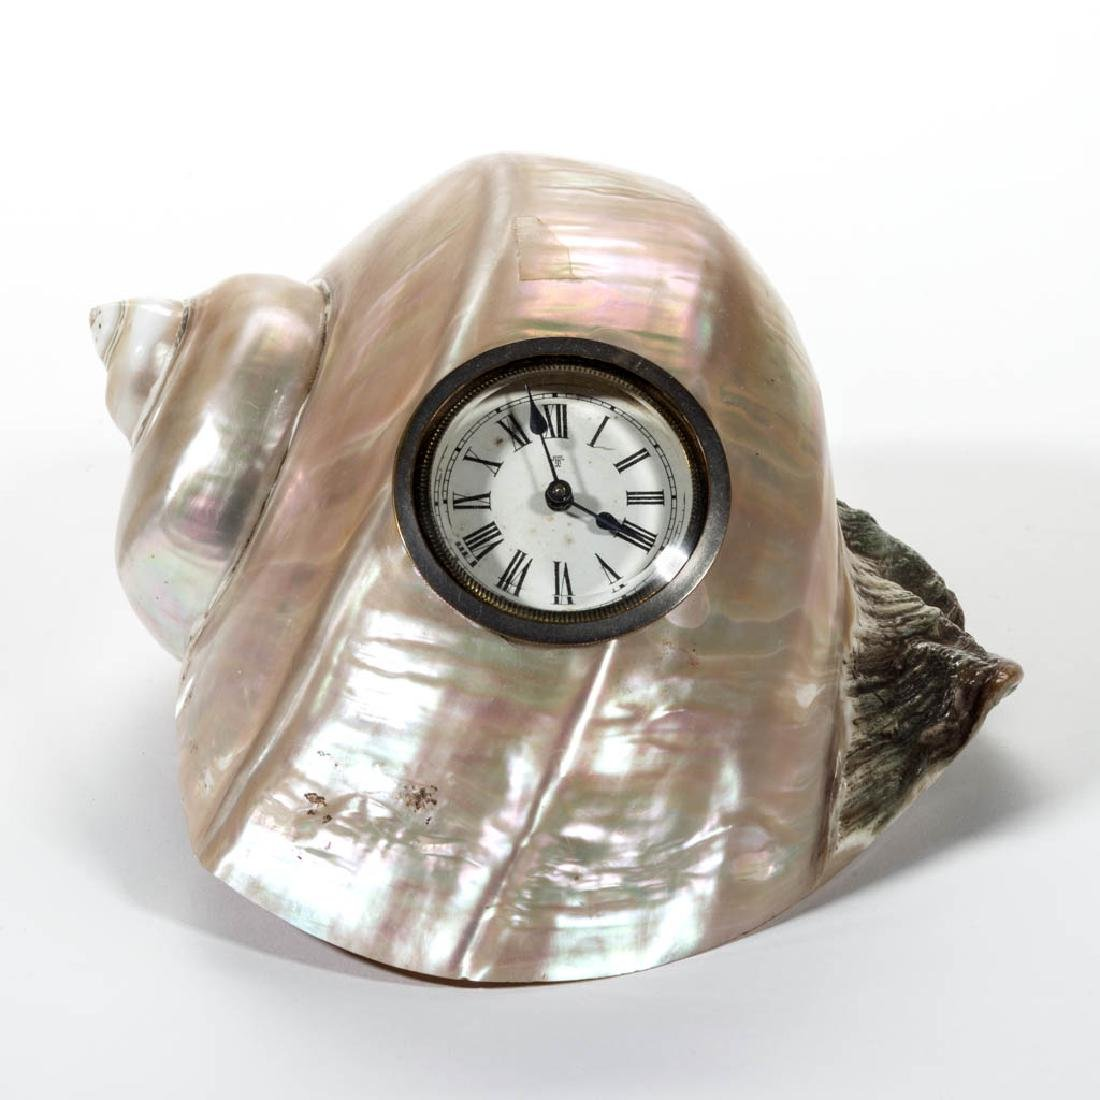 MOTHER-OF-PEARL SEASHELL DESK CLOCK